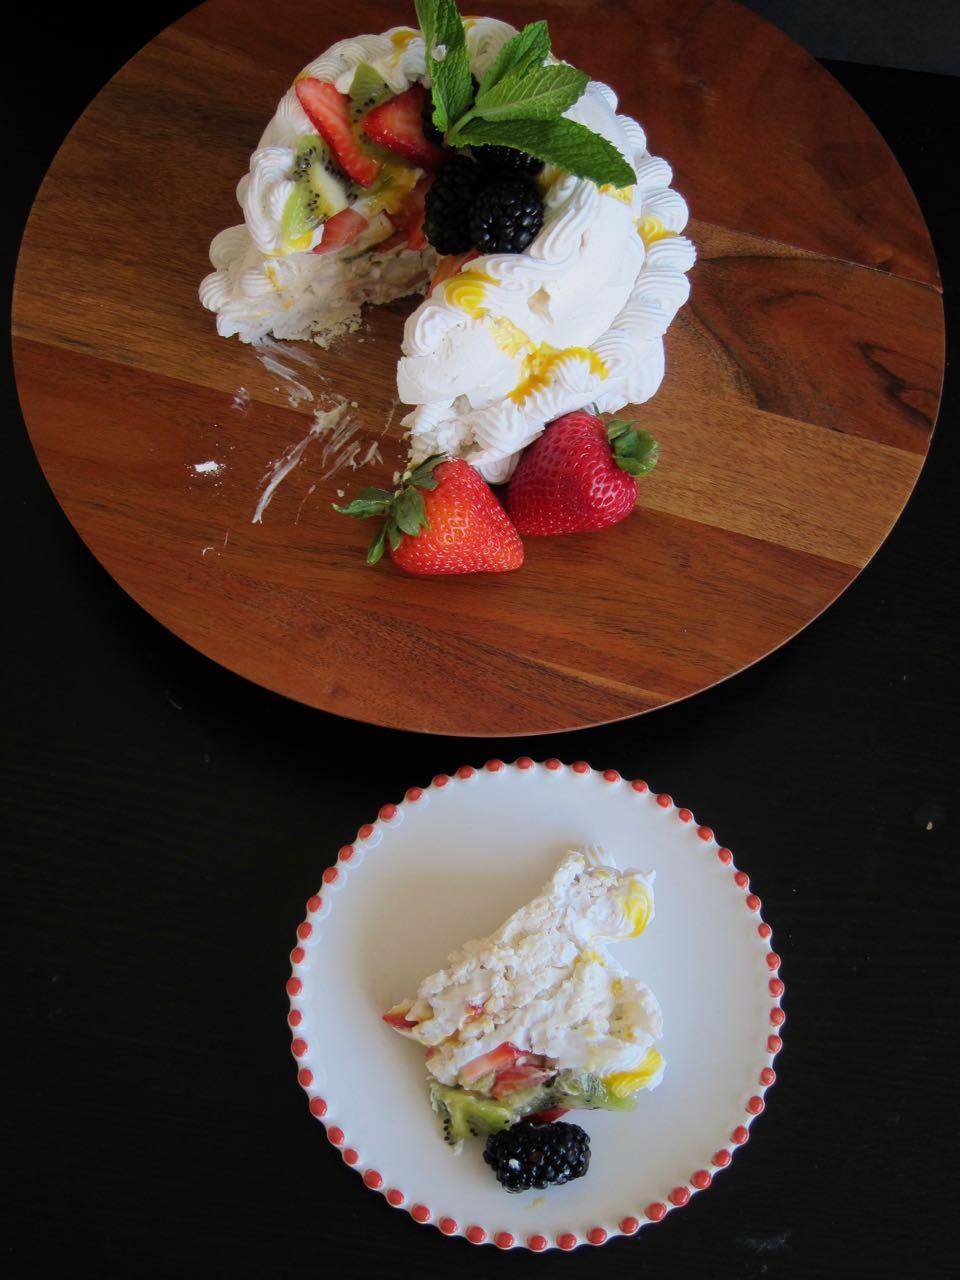 Sliced Vegan Pavlova Cake